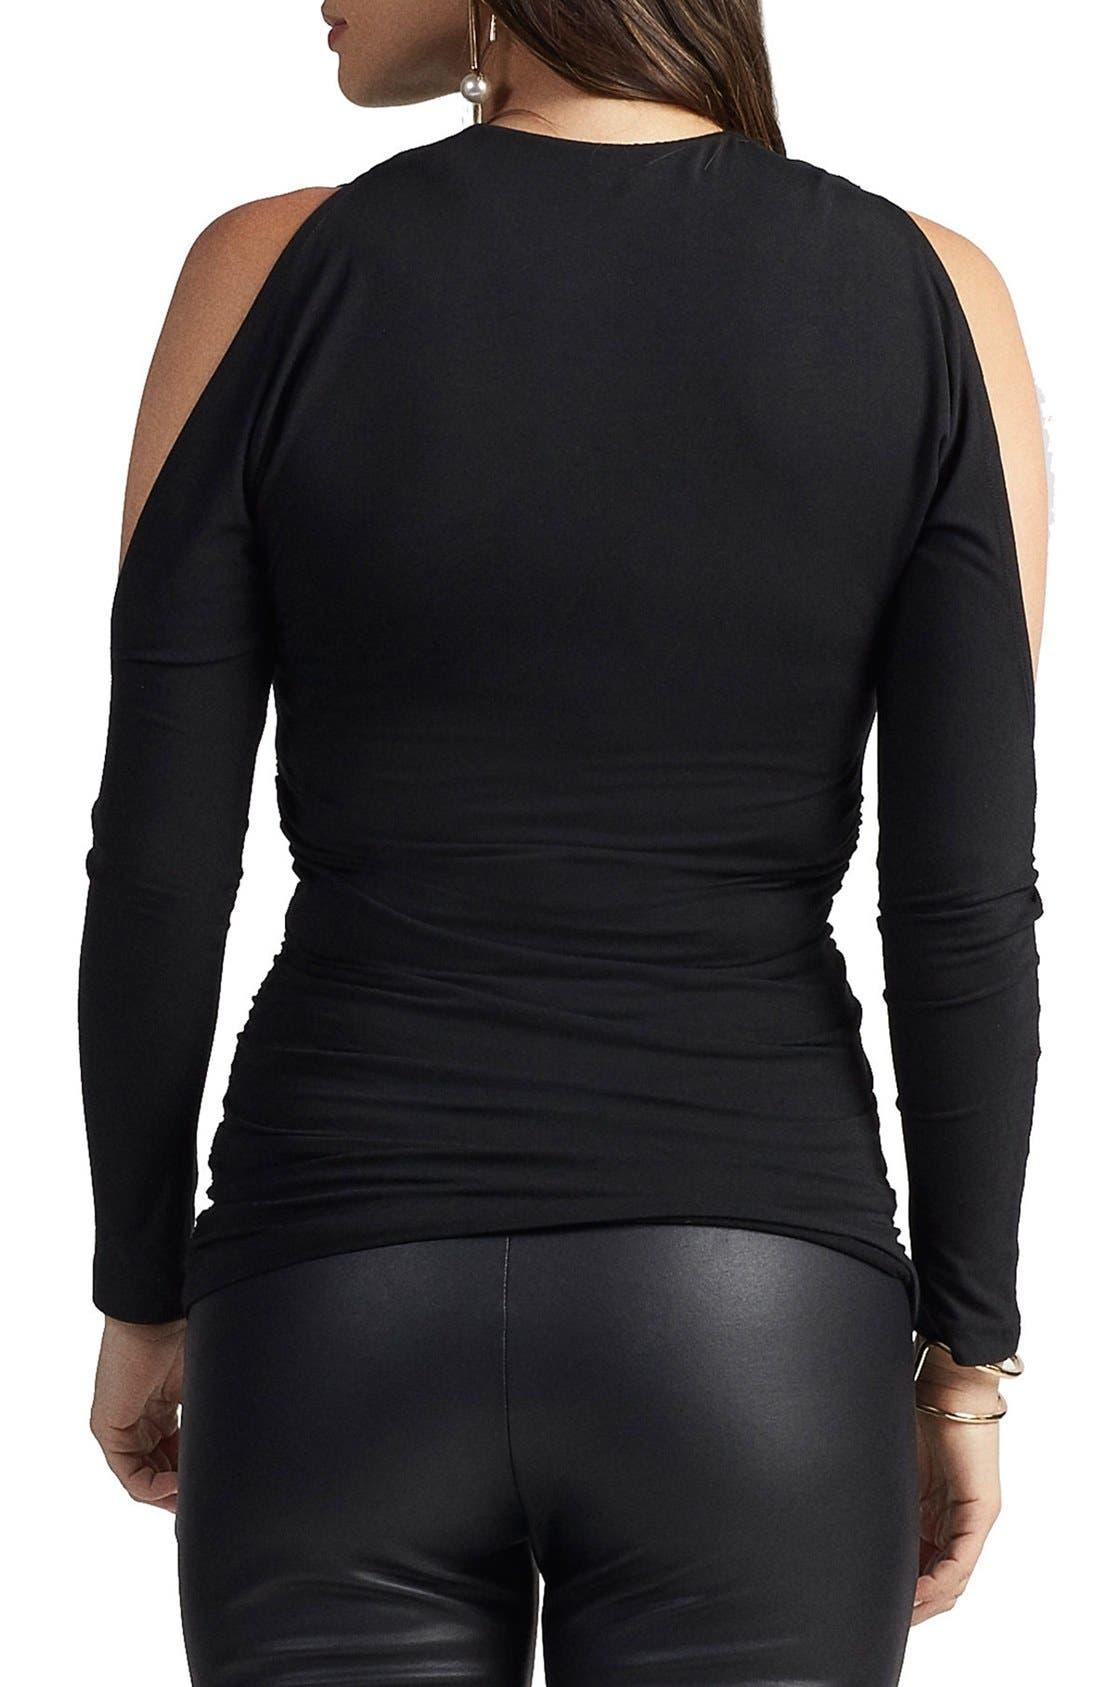 Giza Cold Shoulder Maternity Top,                             Alternate thumbnail 2, color,                             Black